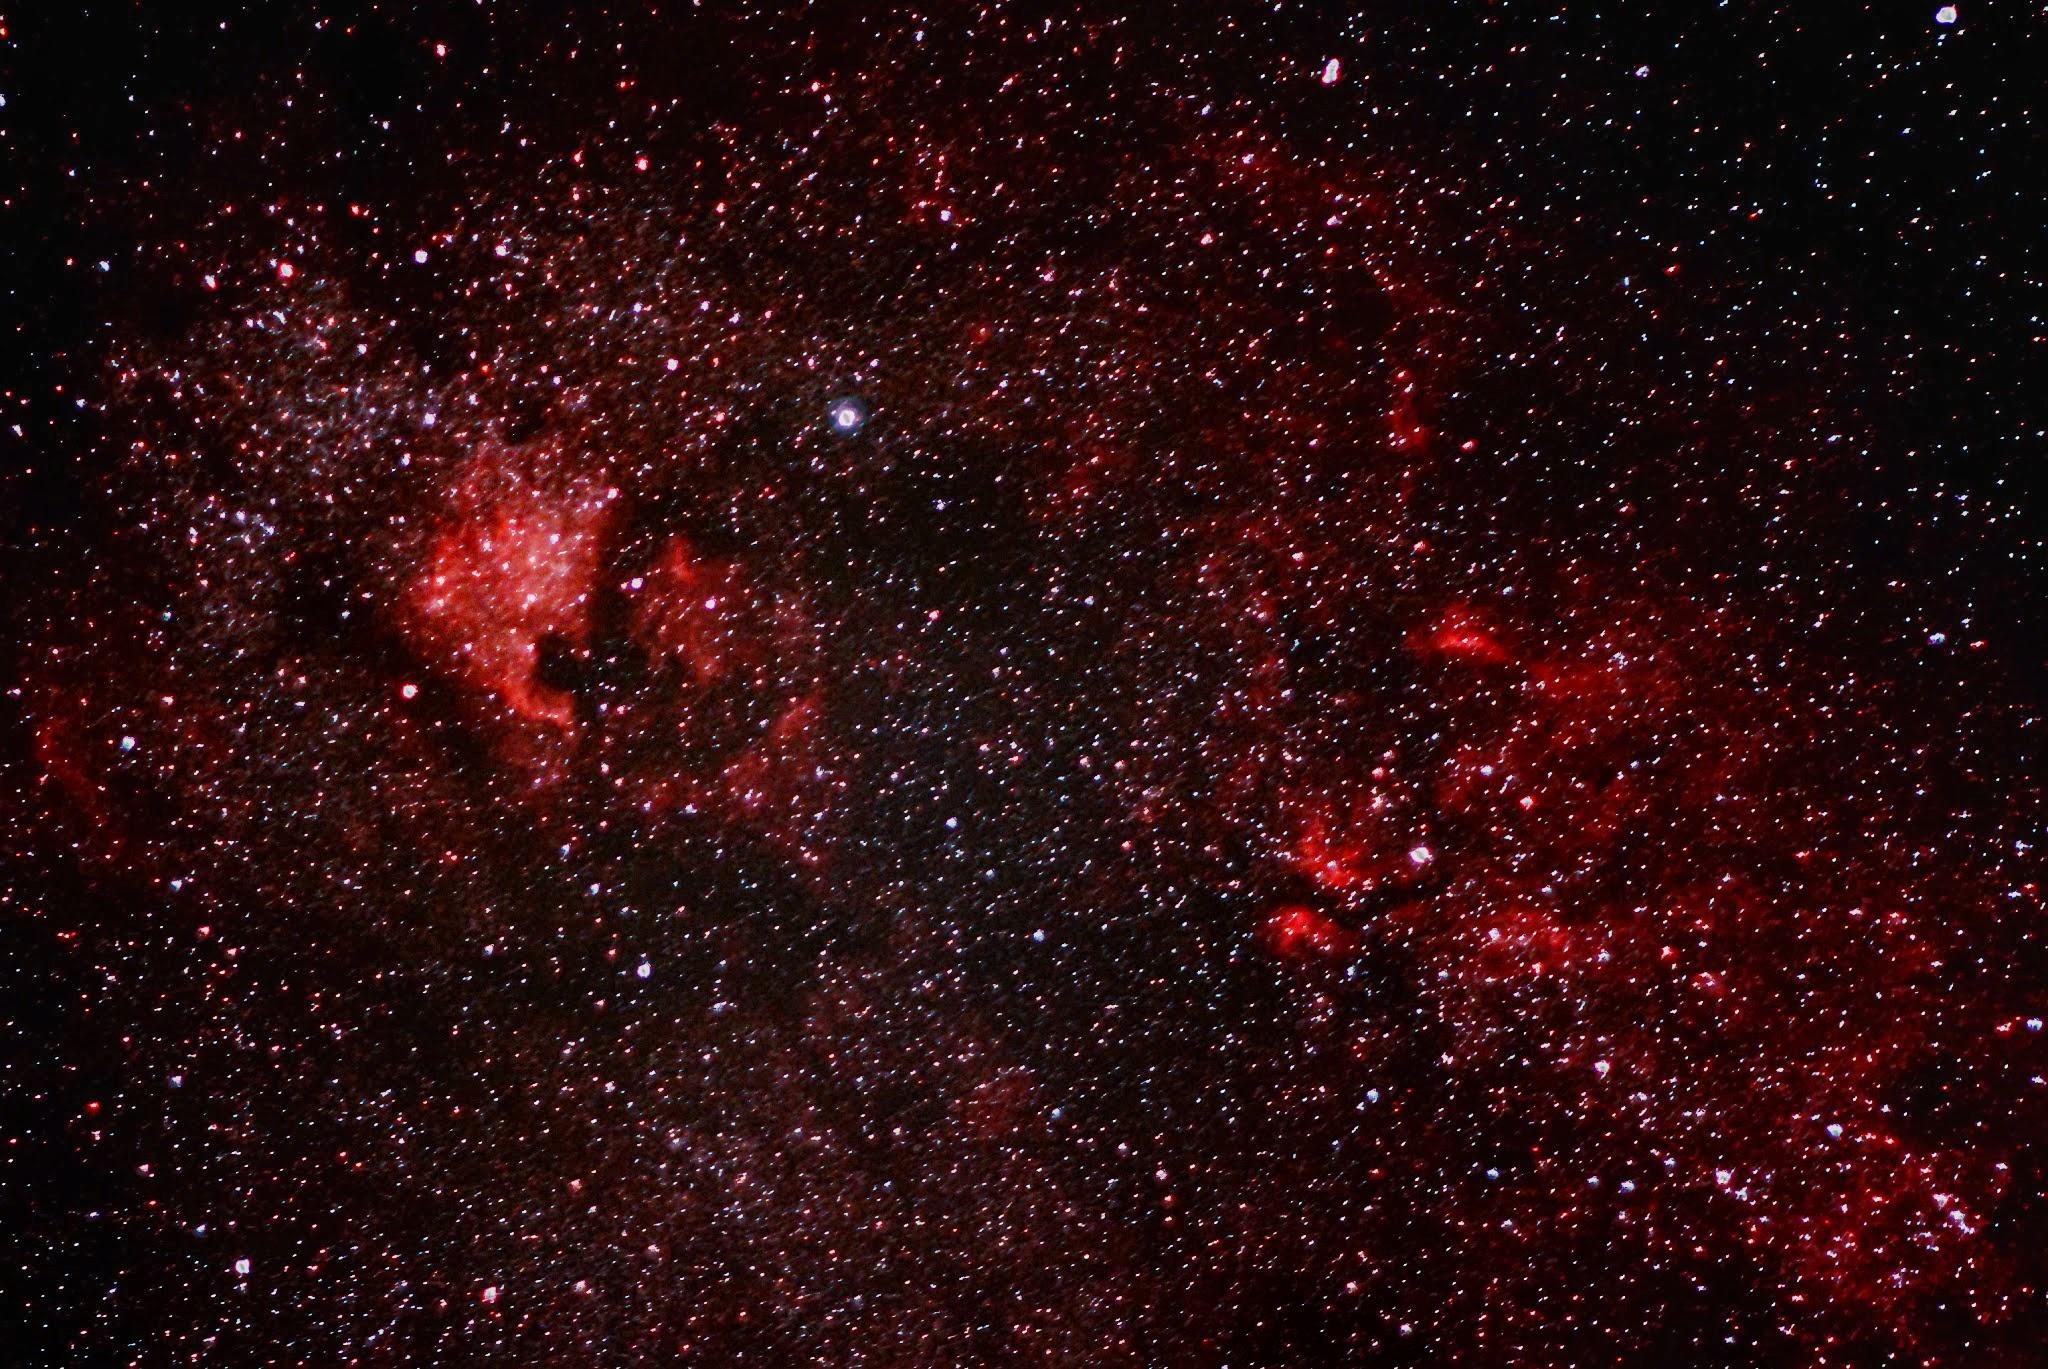 звезды космос фотографии времени суток